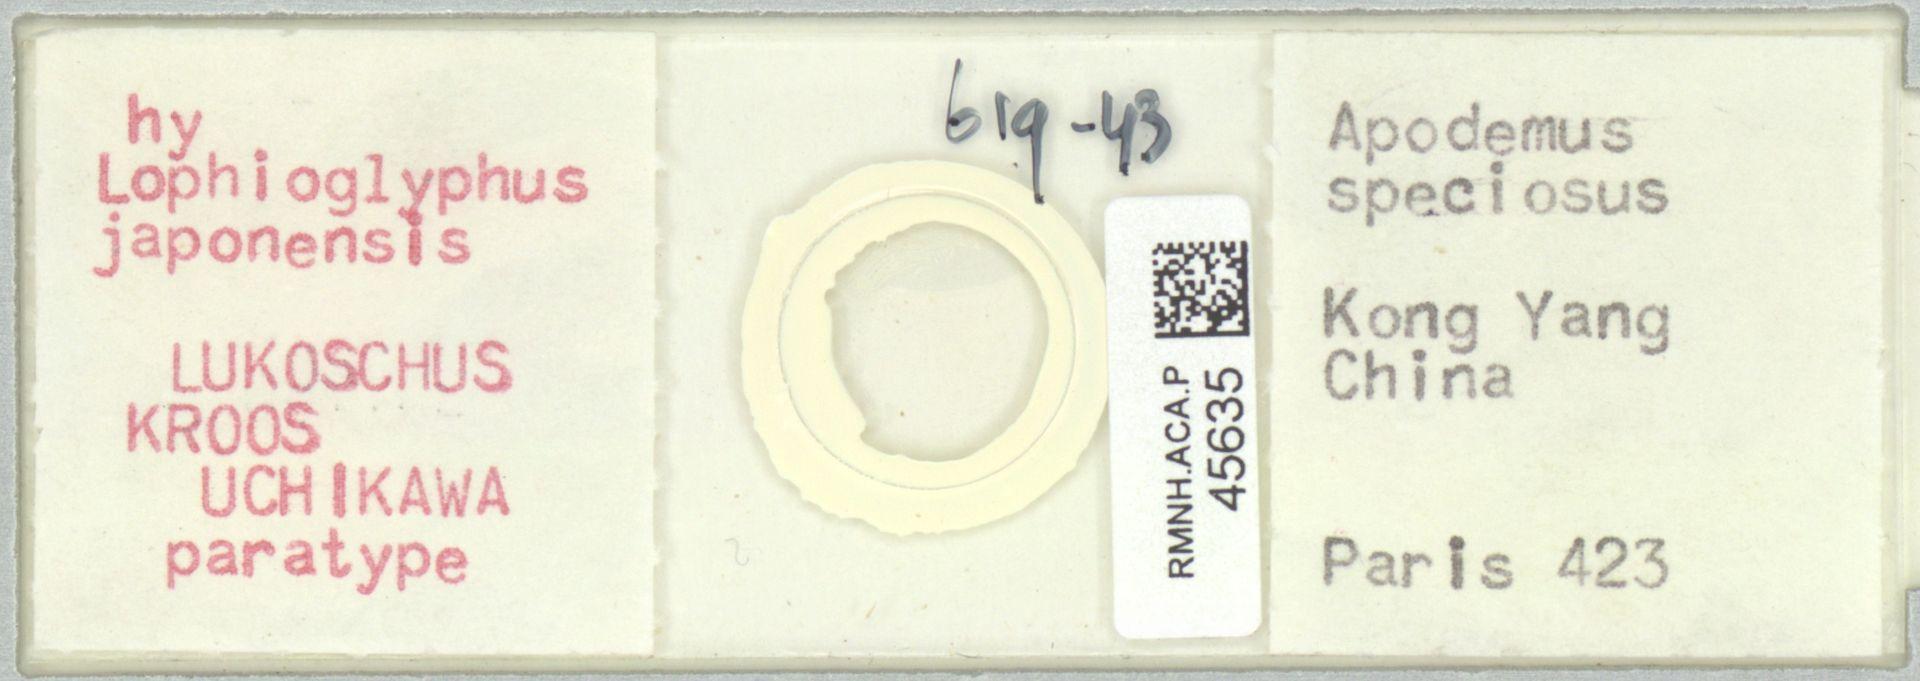 RMNH.ACA.P.45635   Lophioglyphus japonensis Lukoschus, Kroos, Uchikawa